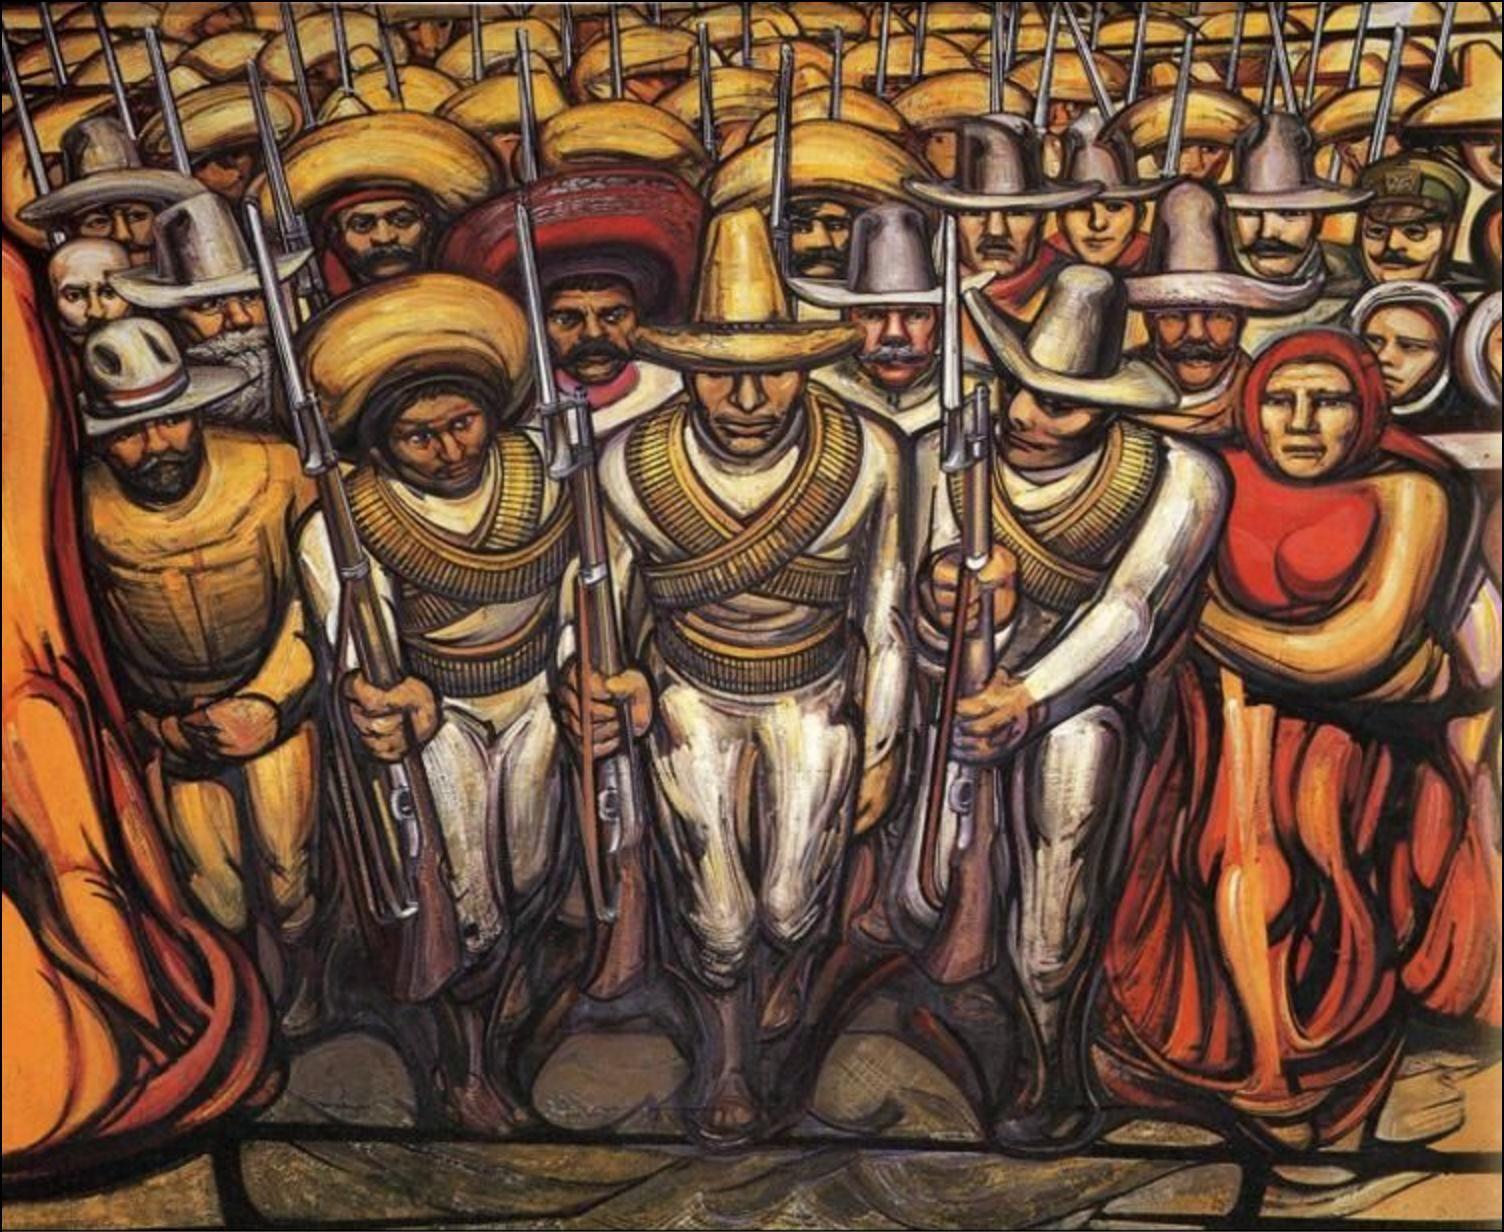 Muralism Timeless Resonances In Latin American Art Con Imagenes